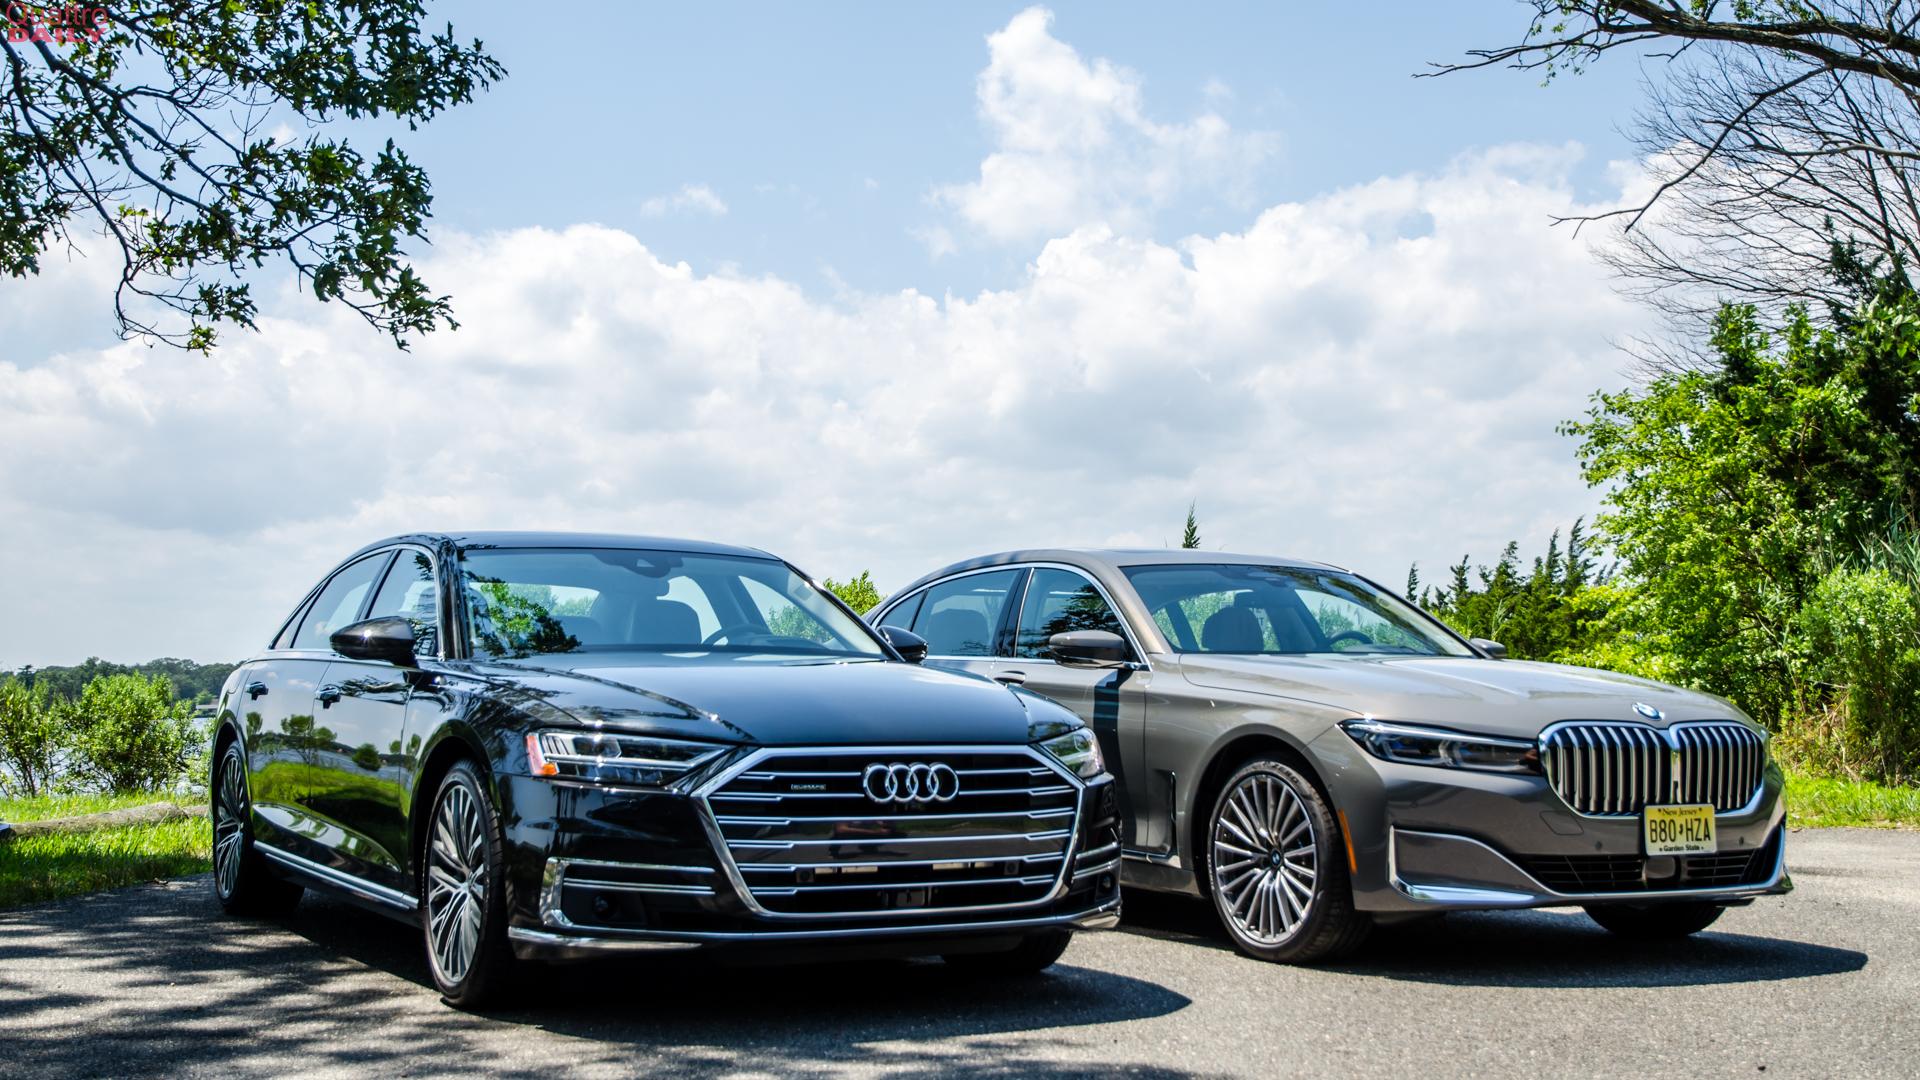 Kelebihan Kekurangan Audi Bmw Tangguh